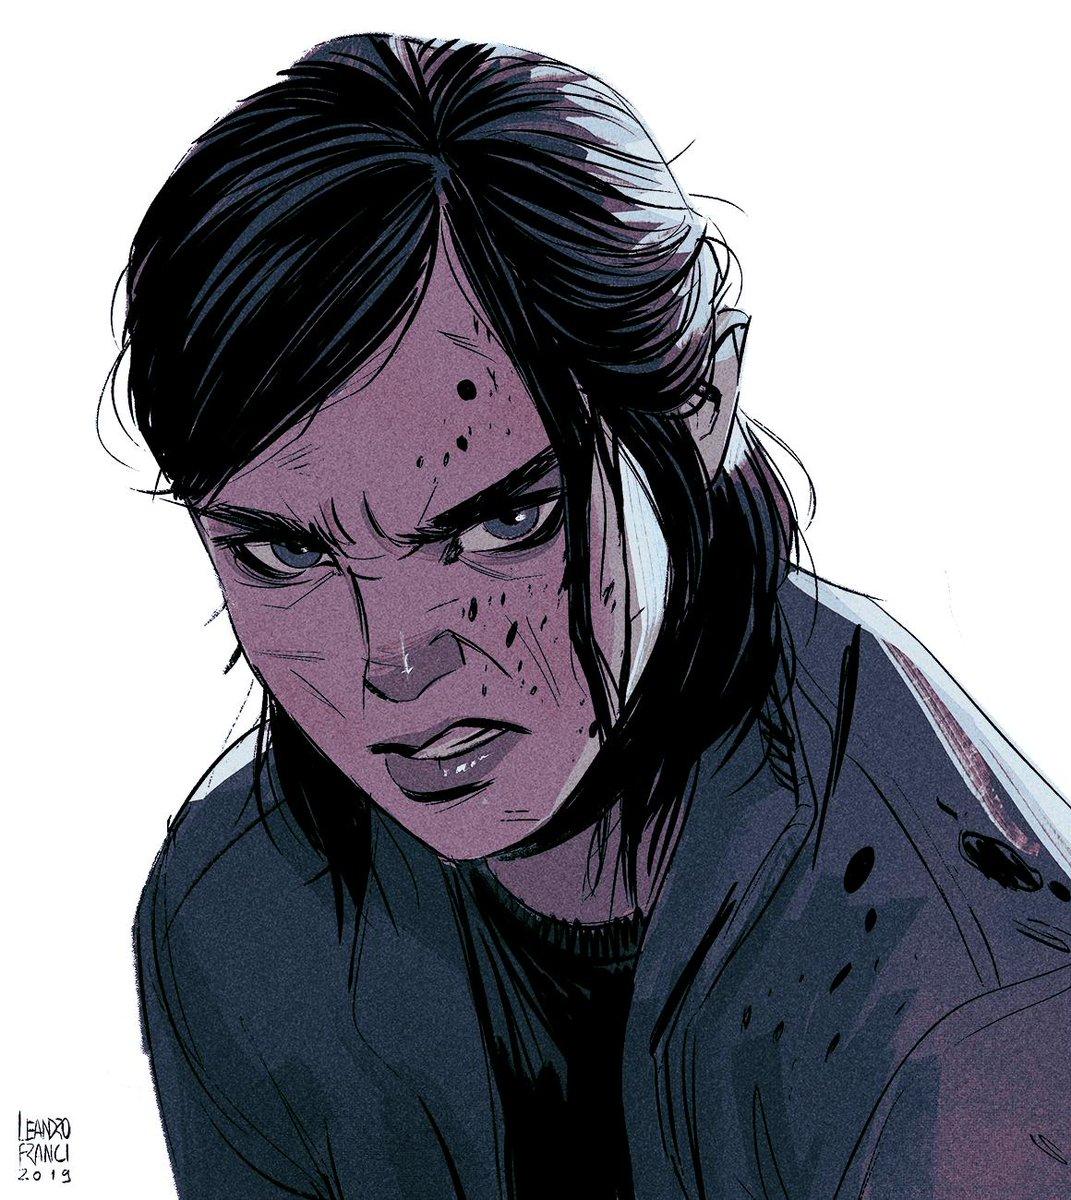 Lenadro Franci On Twitter Inktober 001 Ellie The Last Of Us 2